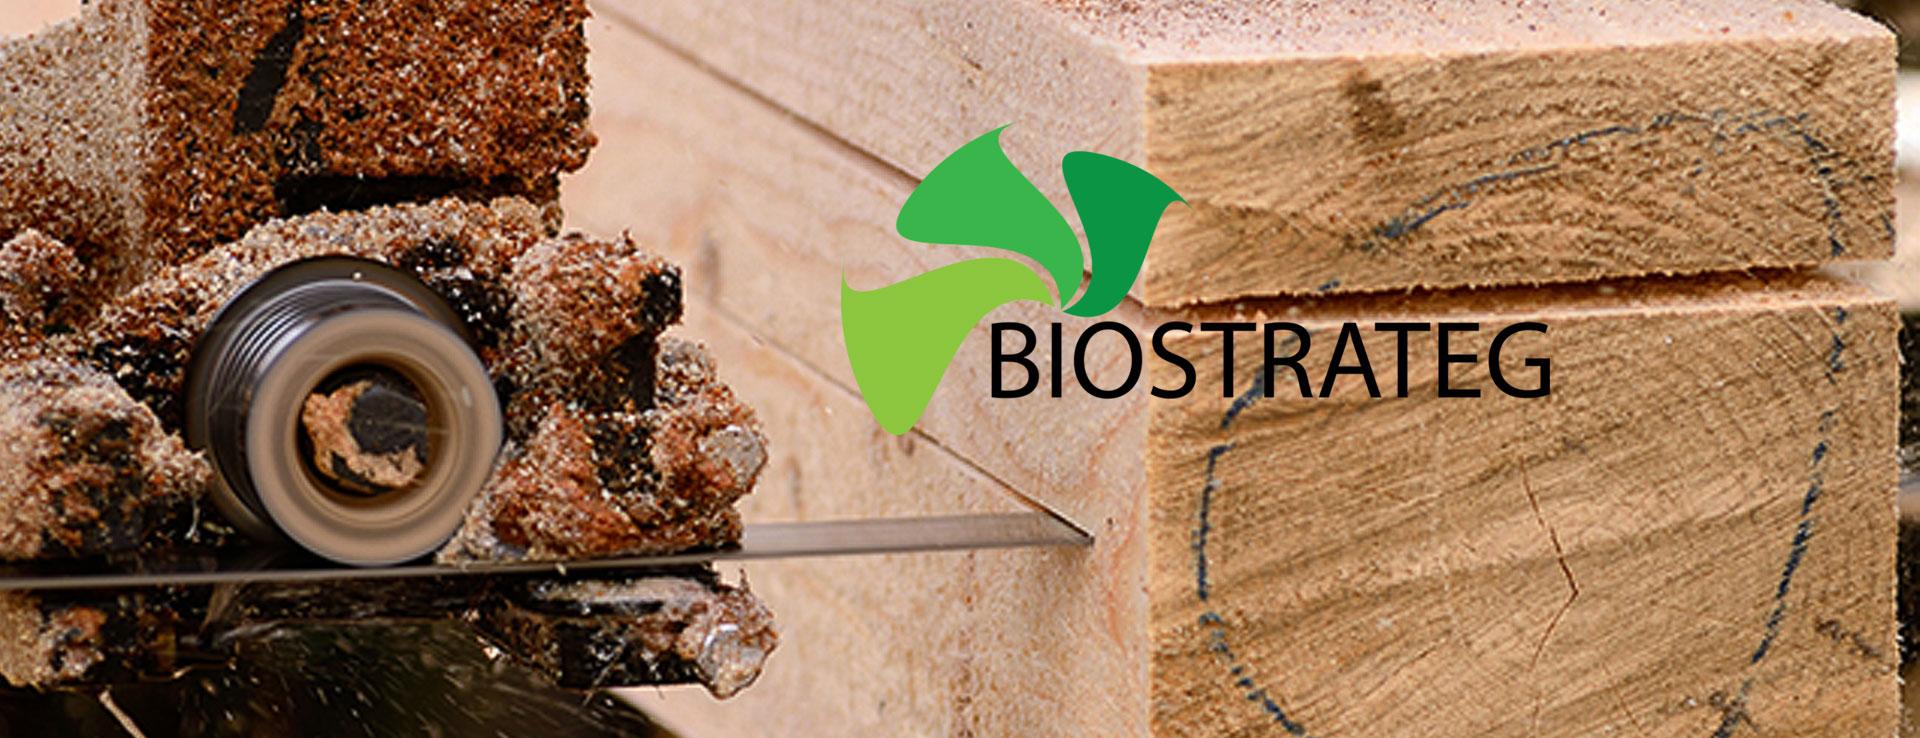 Biostrateg_slide